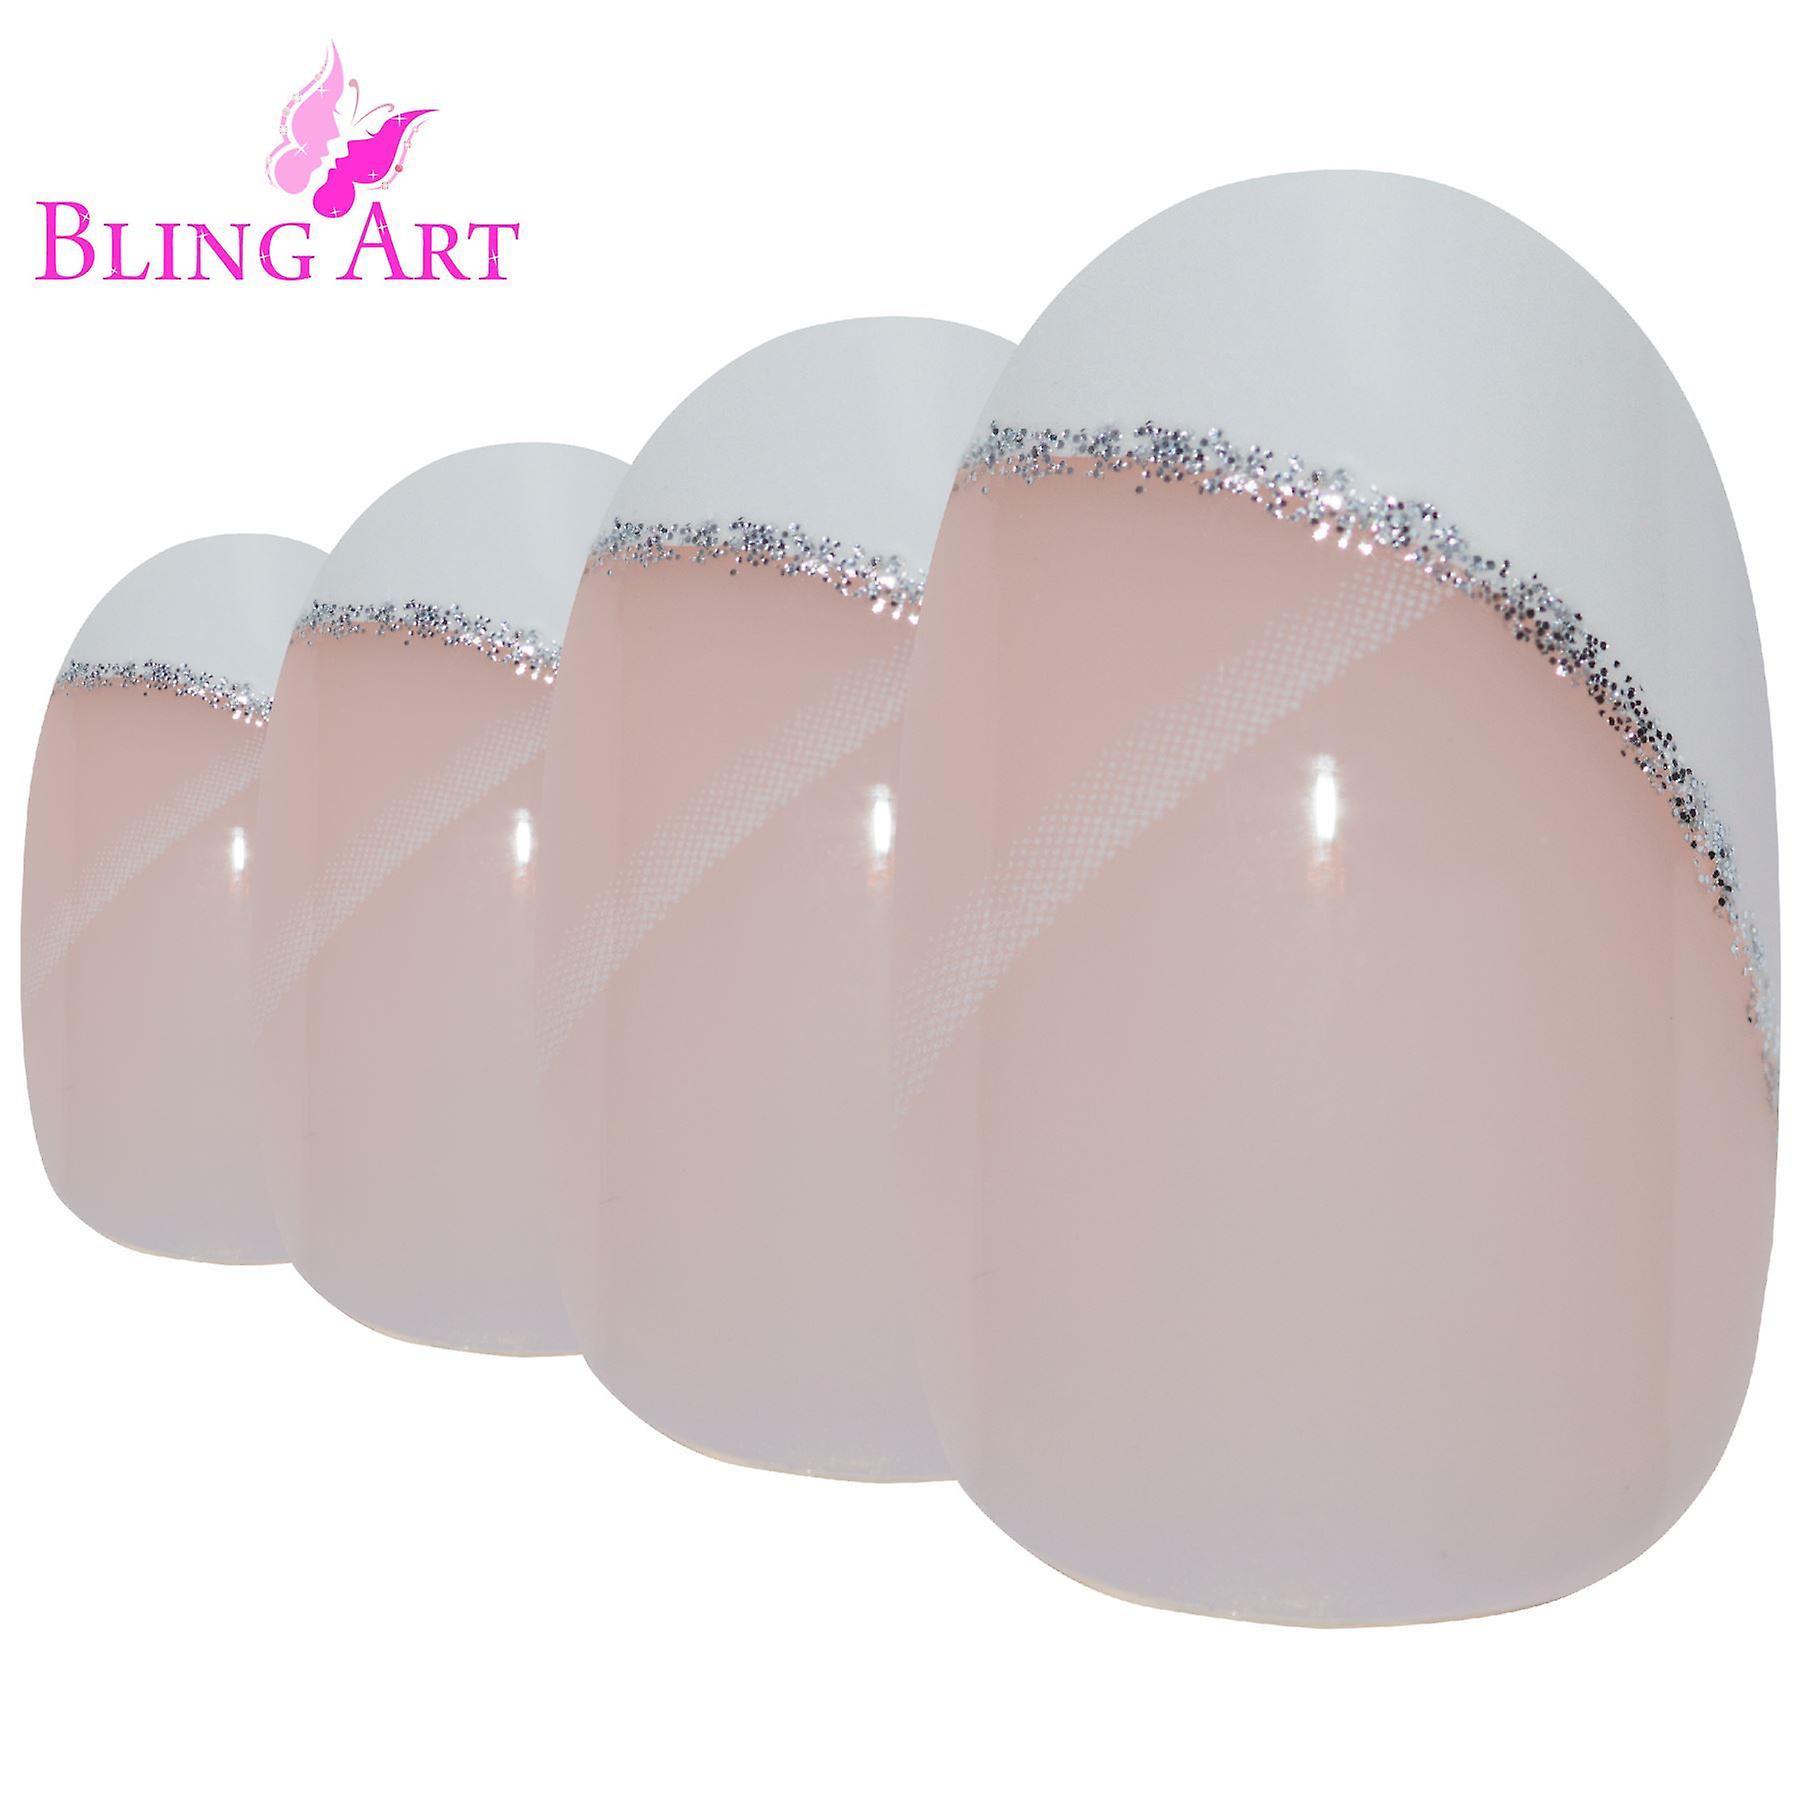 False nails by bling art white polished oval medium fake 24 french nail tips